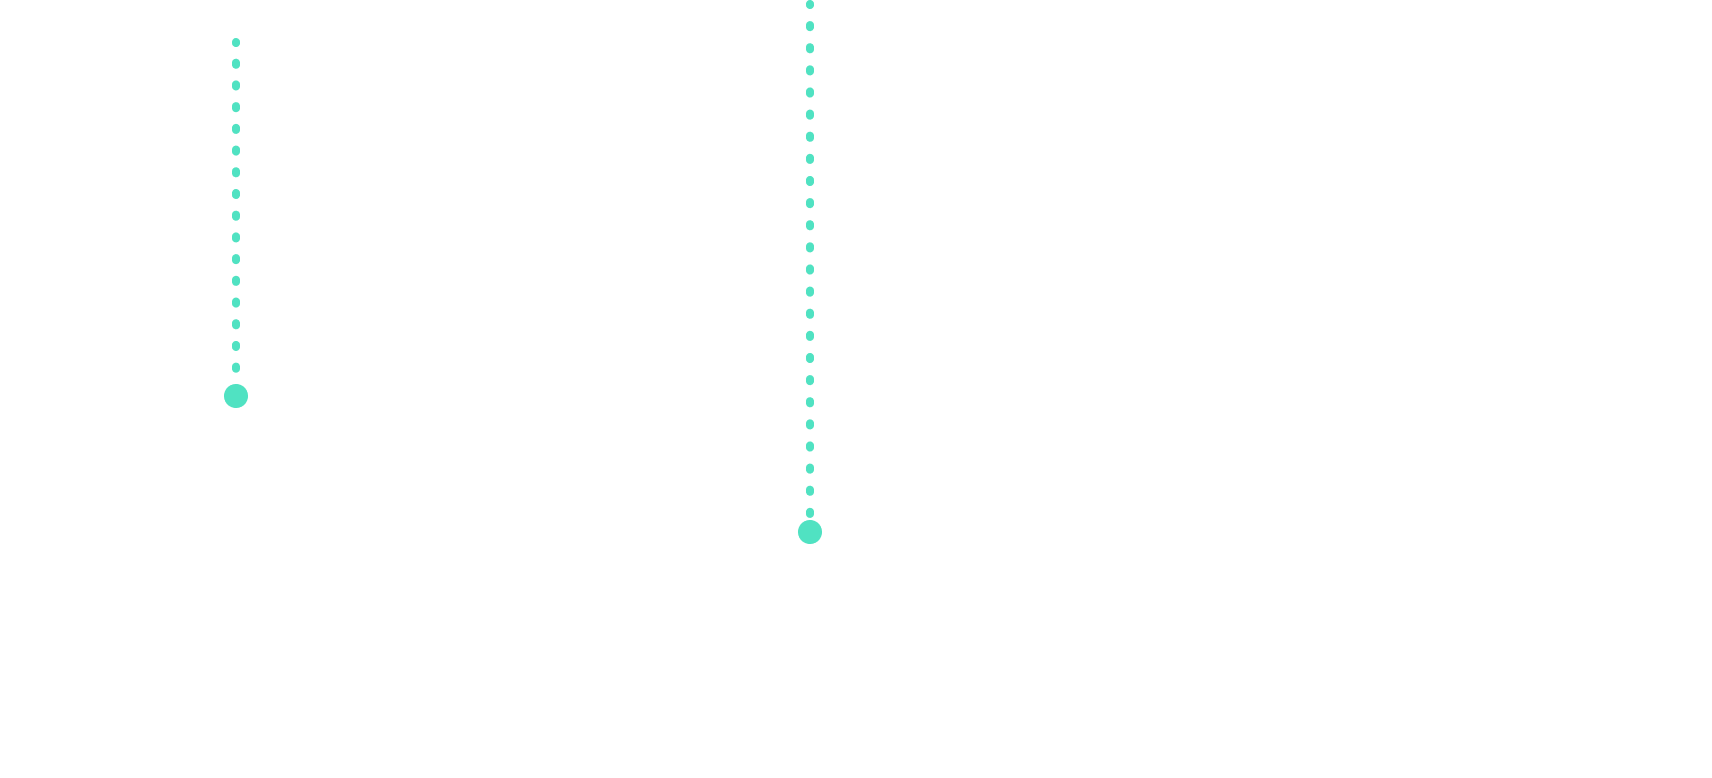 Step 2 - Lines